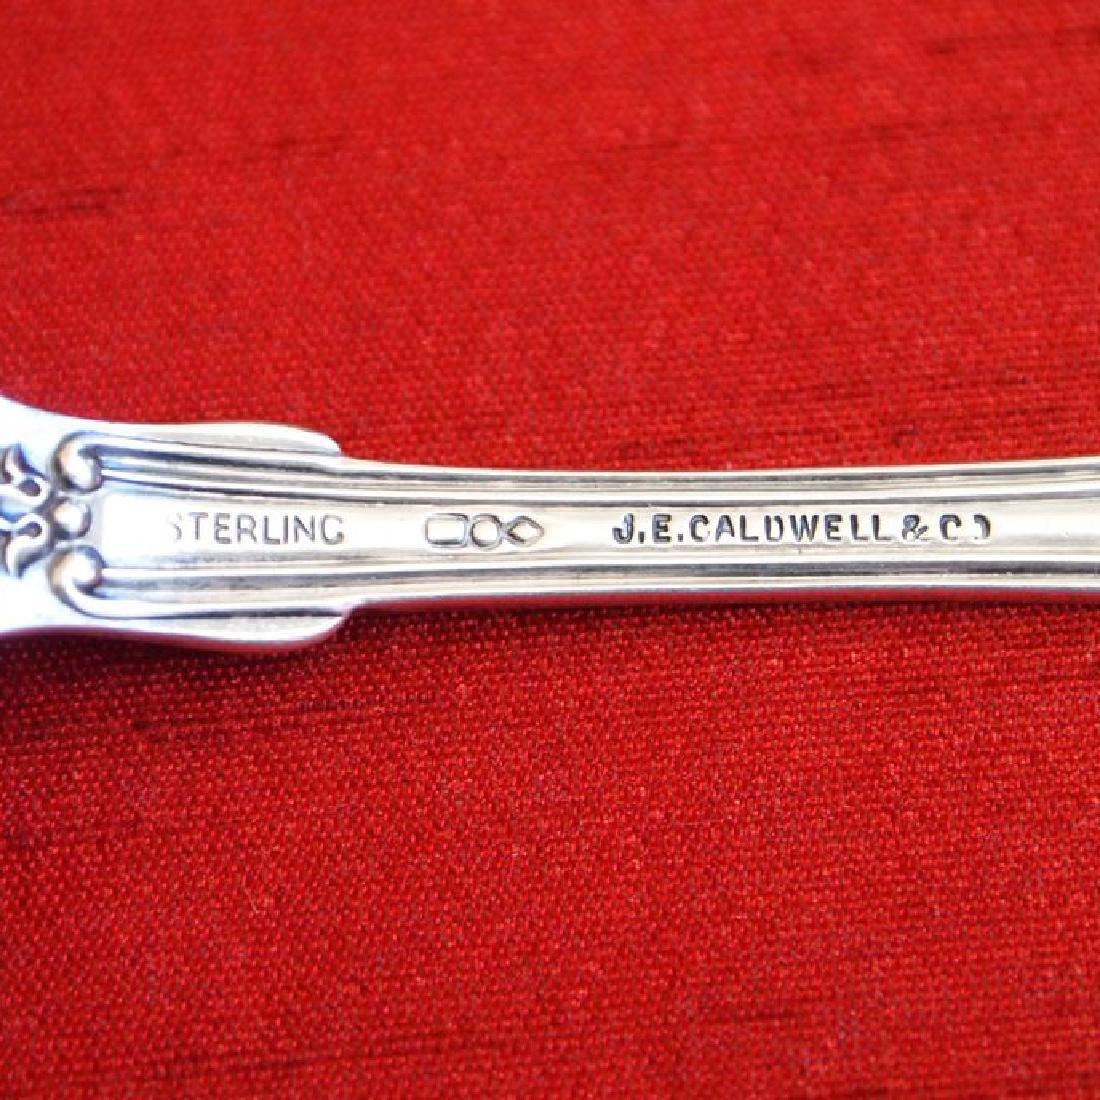 Antique Dominick & Haff Sterling Silver Sugar Spoon - 3